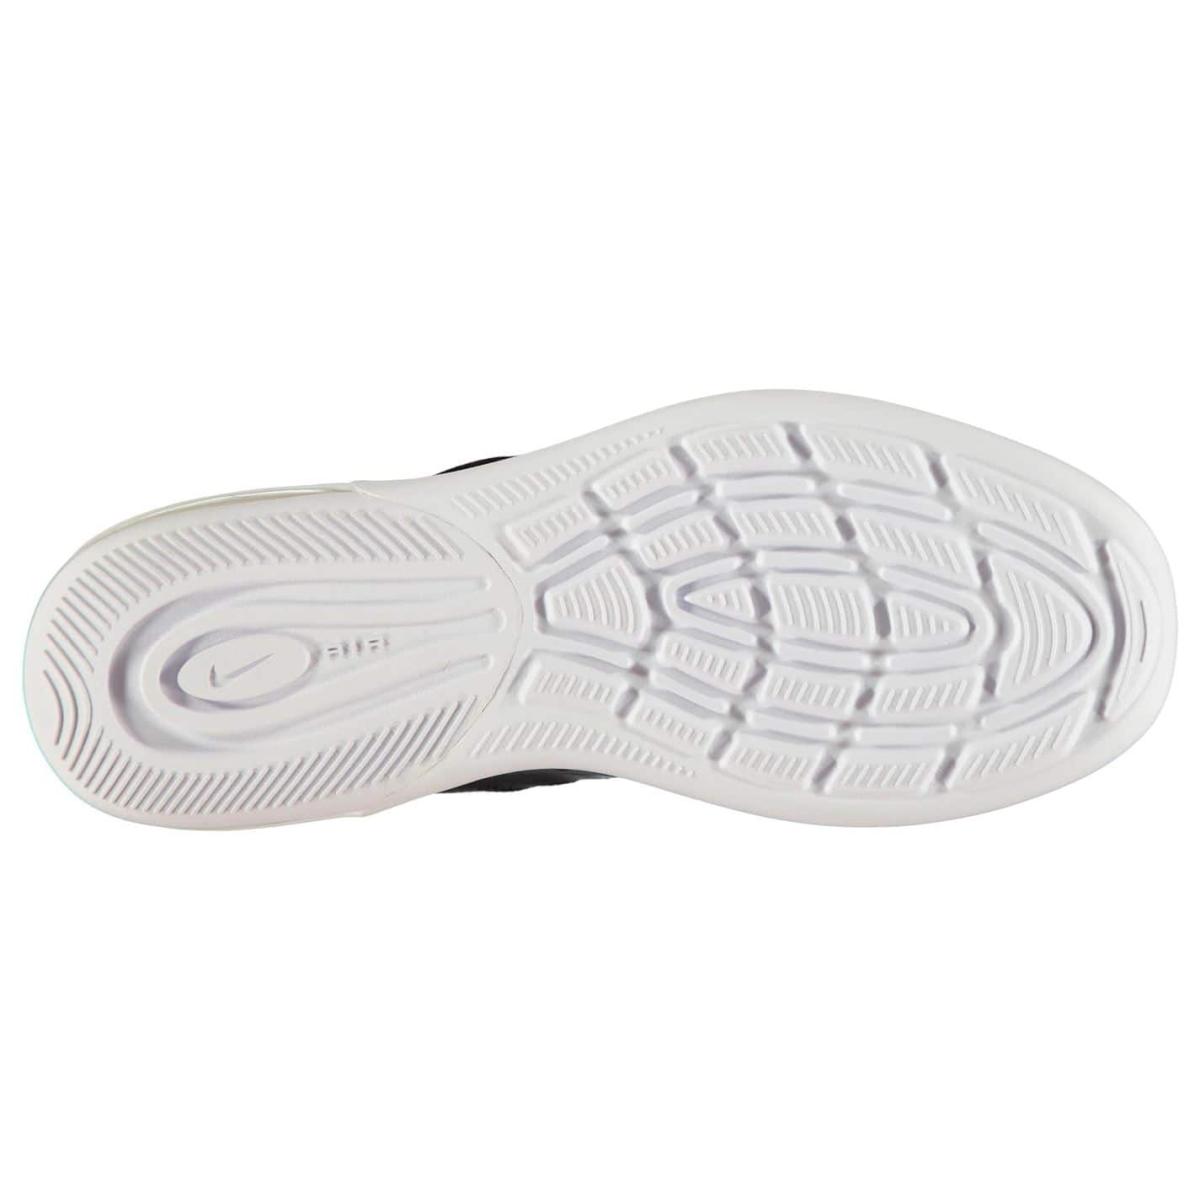 NIKE-Air-Max-Axis-Scarpe-da-ginnastica-Scarpe-da-Corsa-Uomo-Sneaker-Scarpe-Sportive-Fitness-1313 miniatura 27